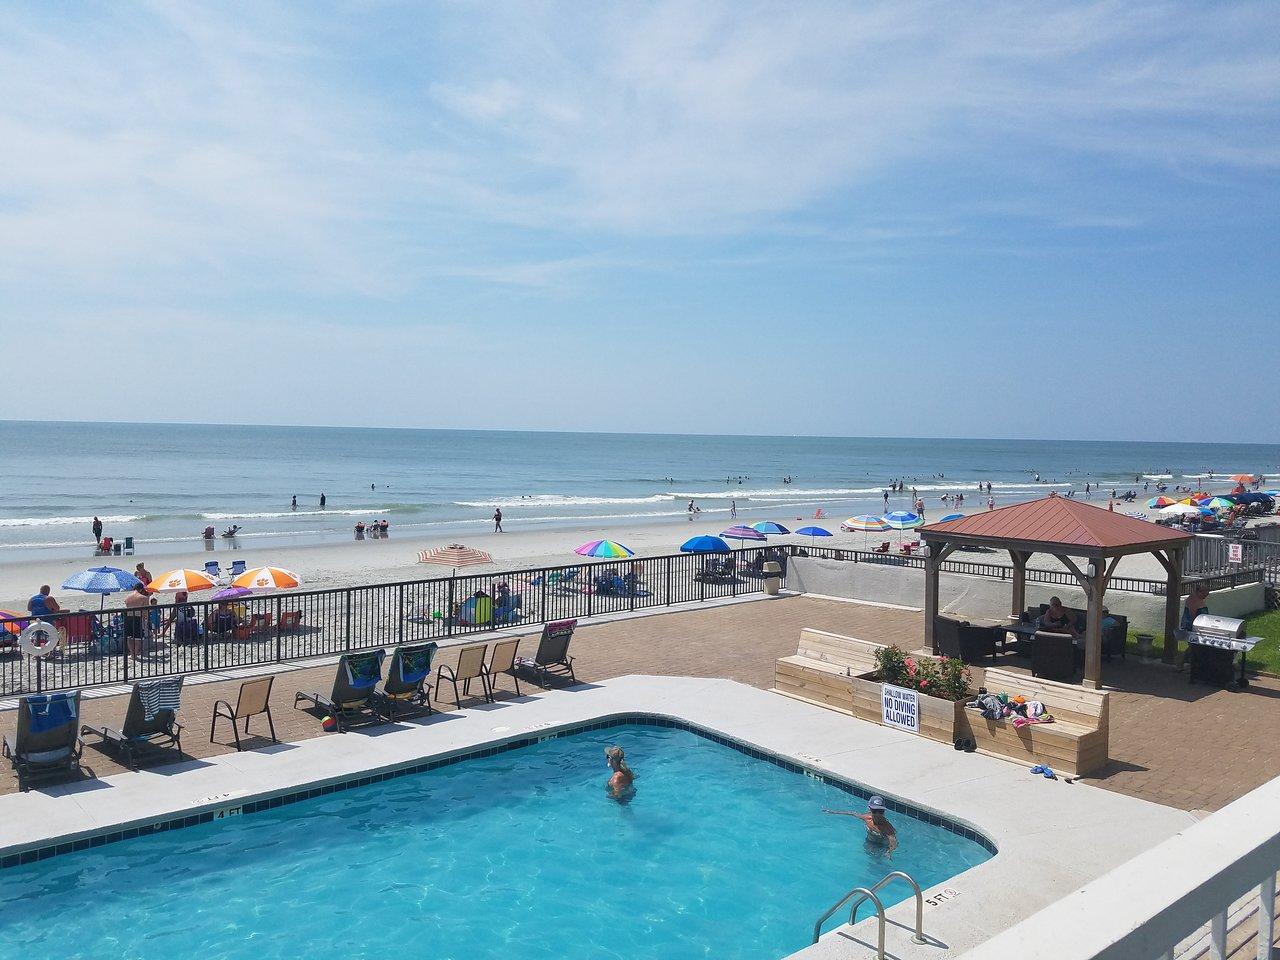 garden city inn updated 2018 prices hotel reviews murrells inlet sc tripadvisor - Garden City Inn